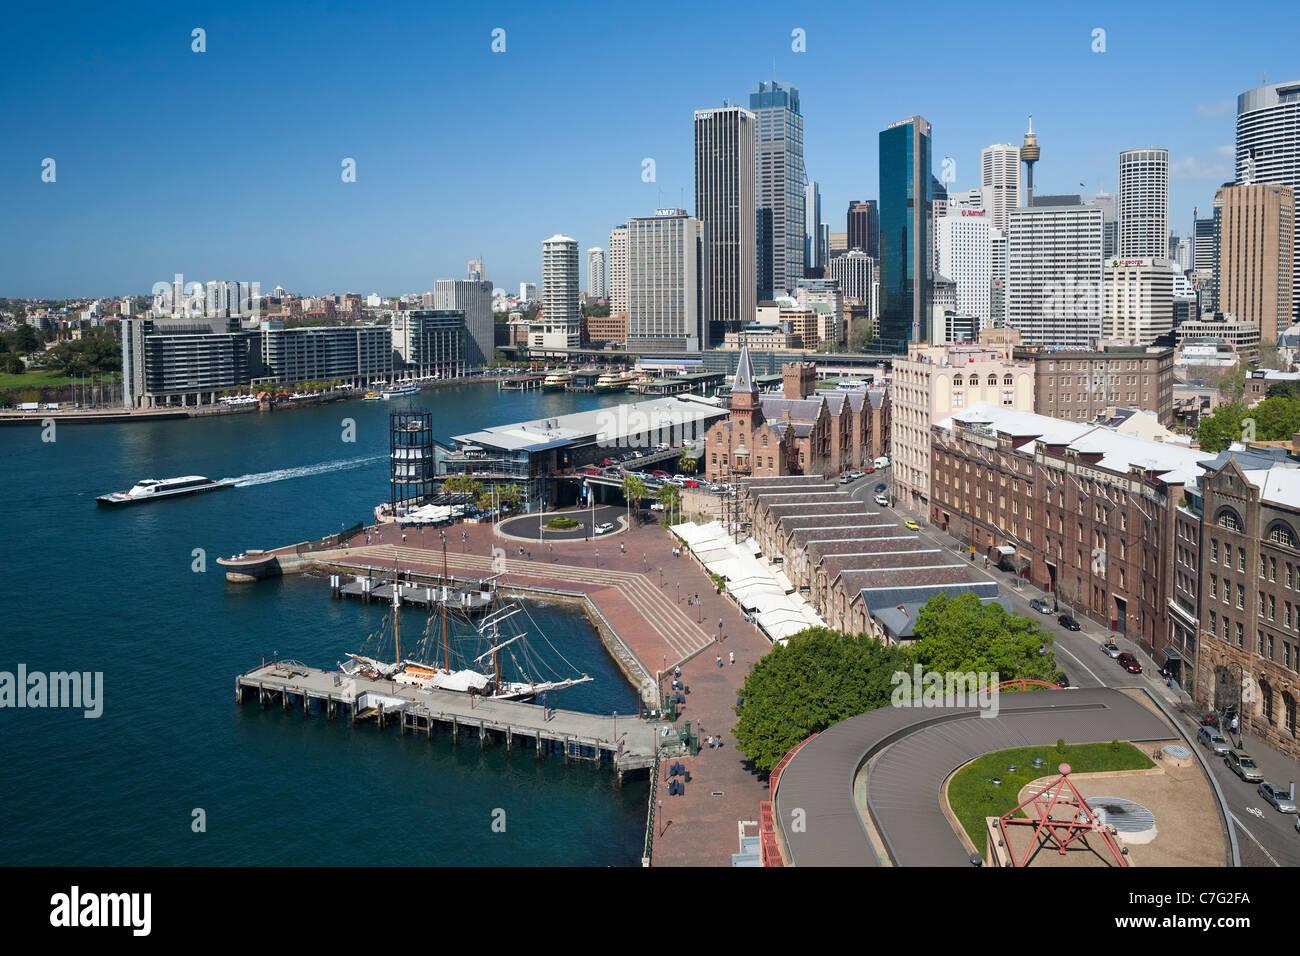 Overseas passenger terminal, The Rocks, Sydney CBD, Australia - Stock Image